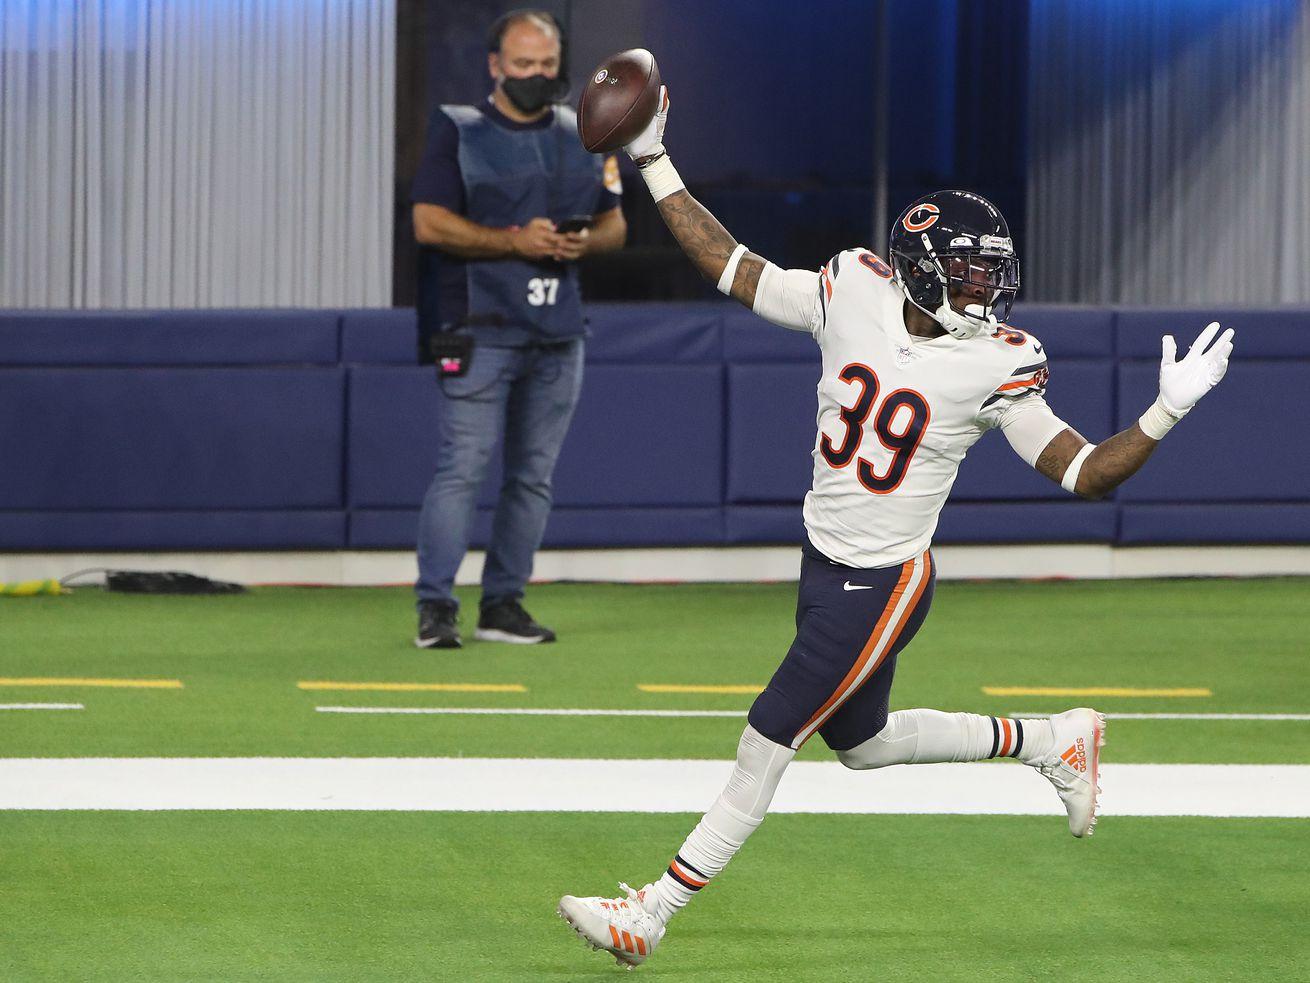 Bears safety Eddie Jackson celebrates his touchdown Monday night in Los Angeles.